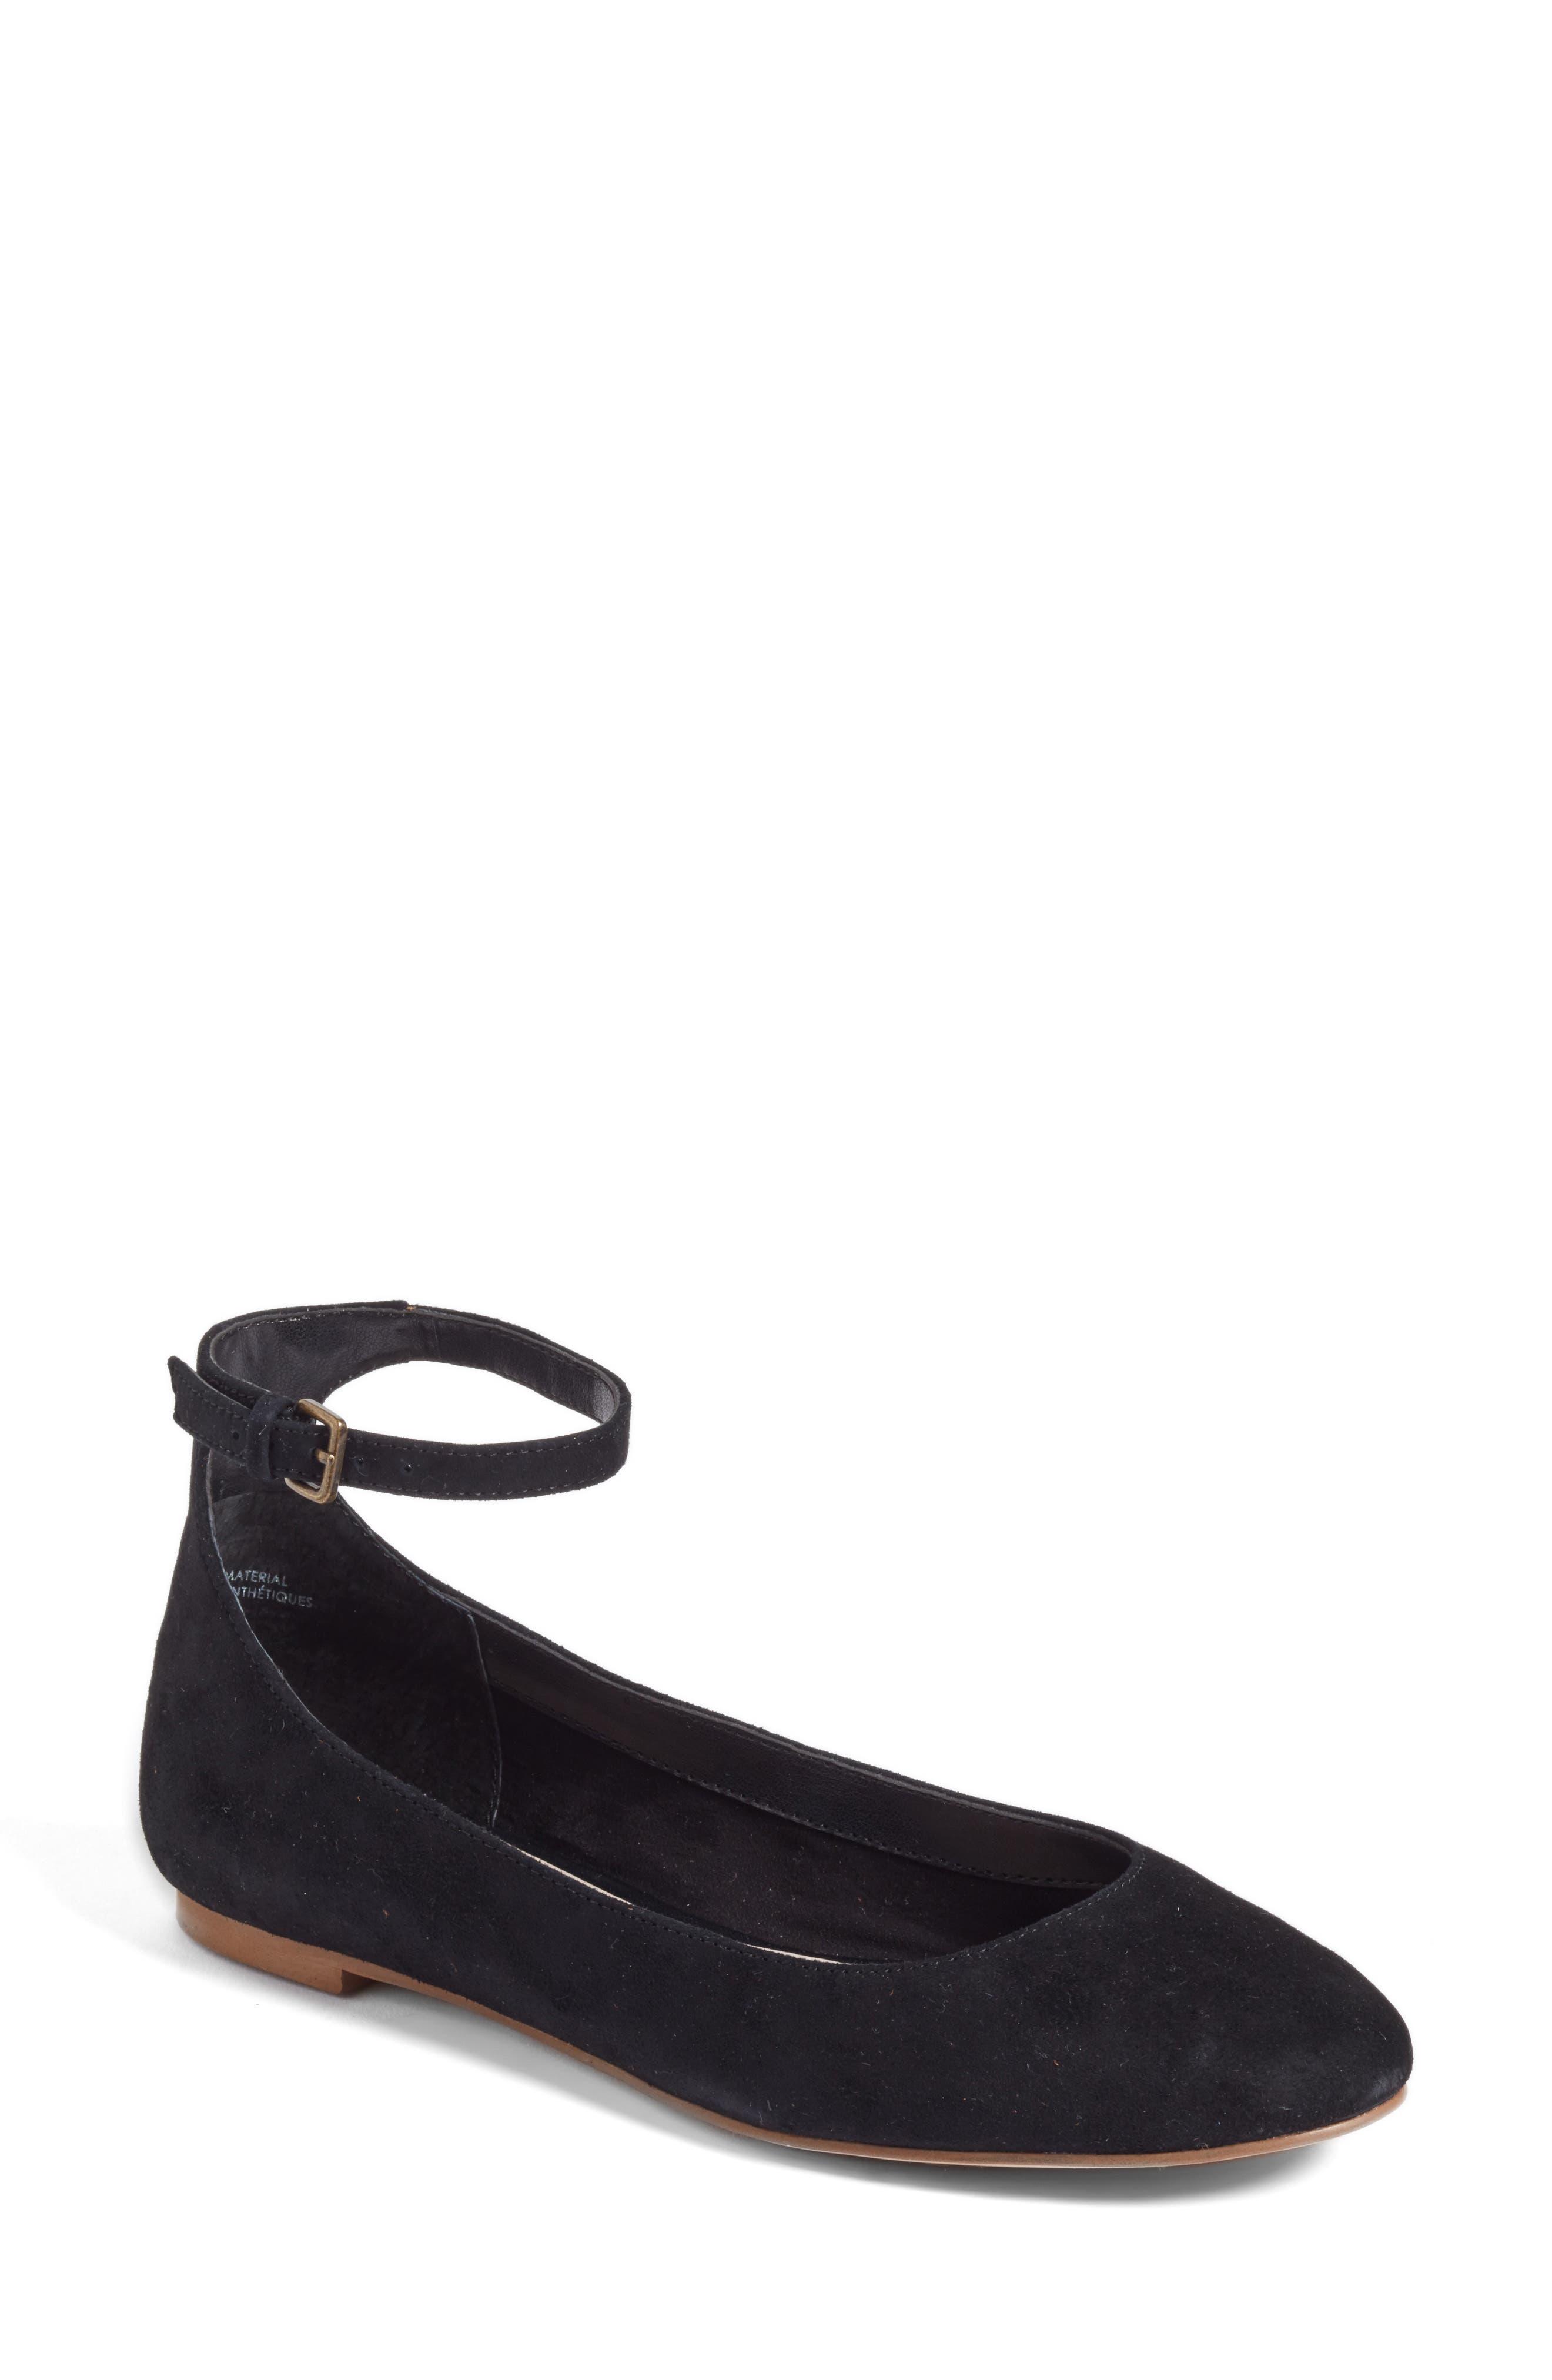 Treasure & Bond Jules Ankle Strap Ballet Flat (Women)